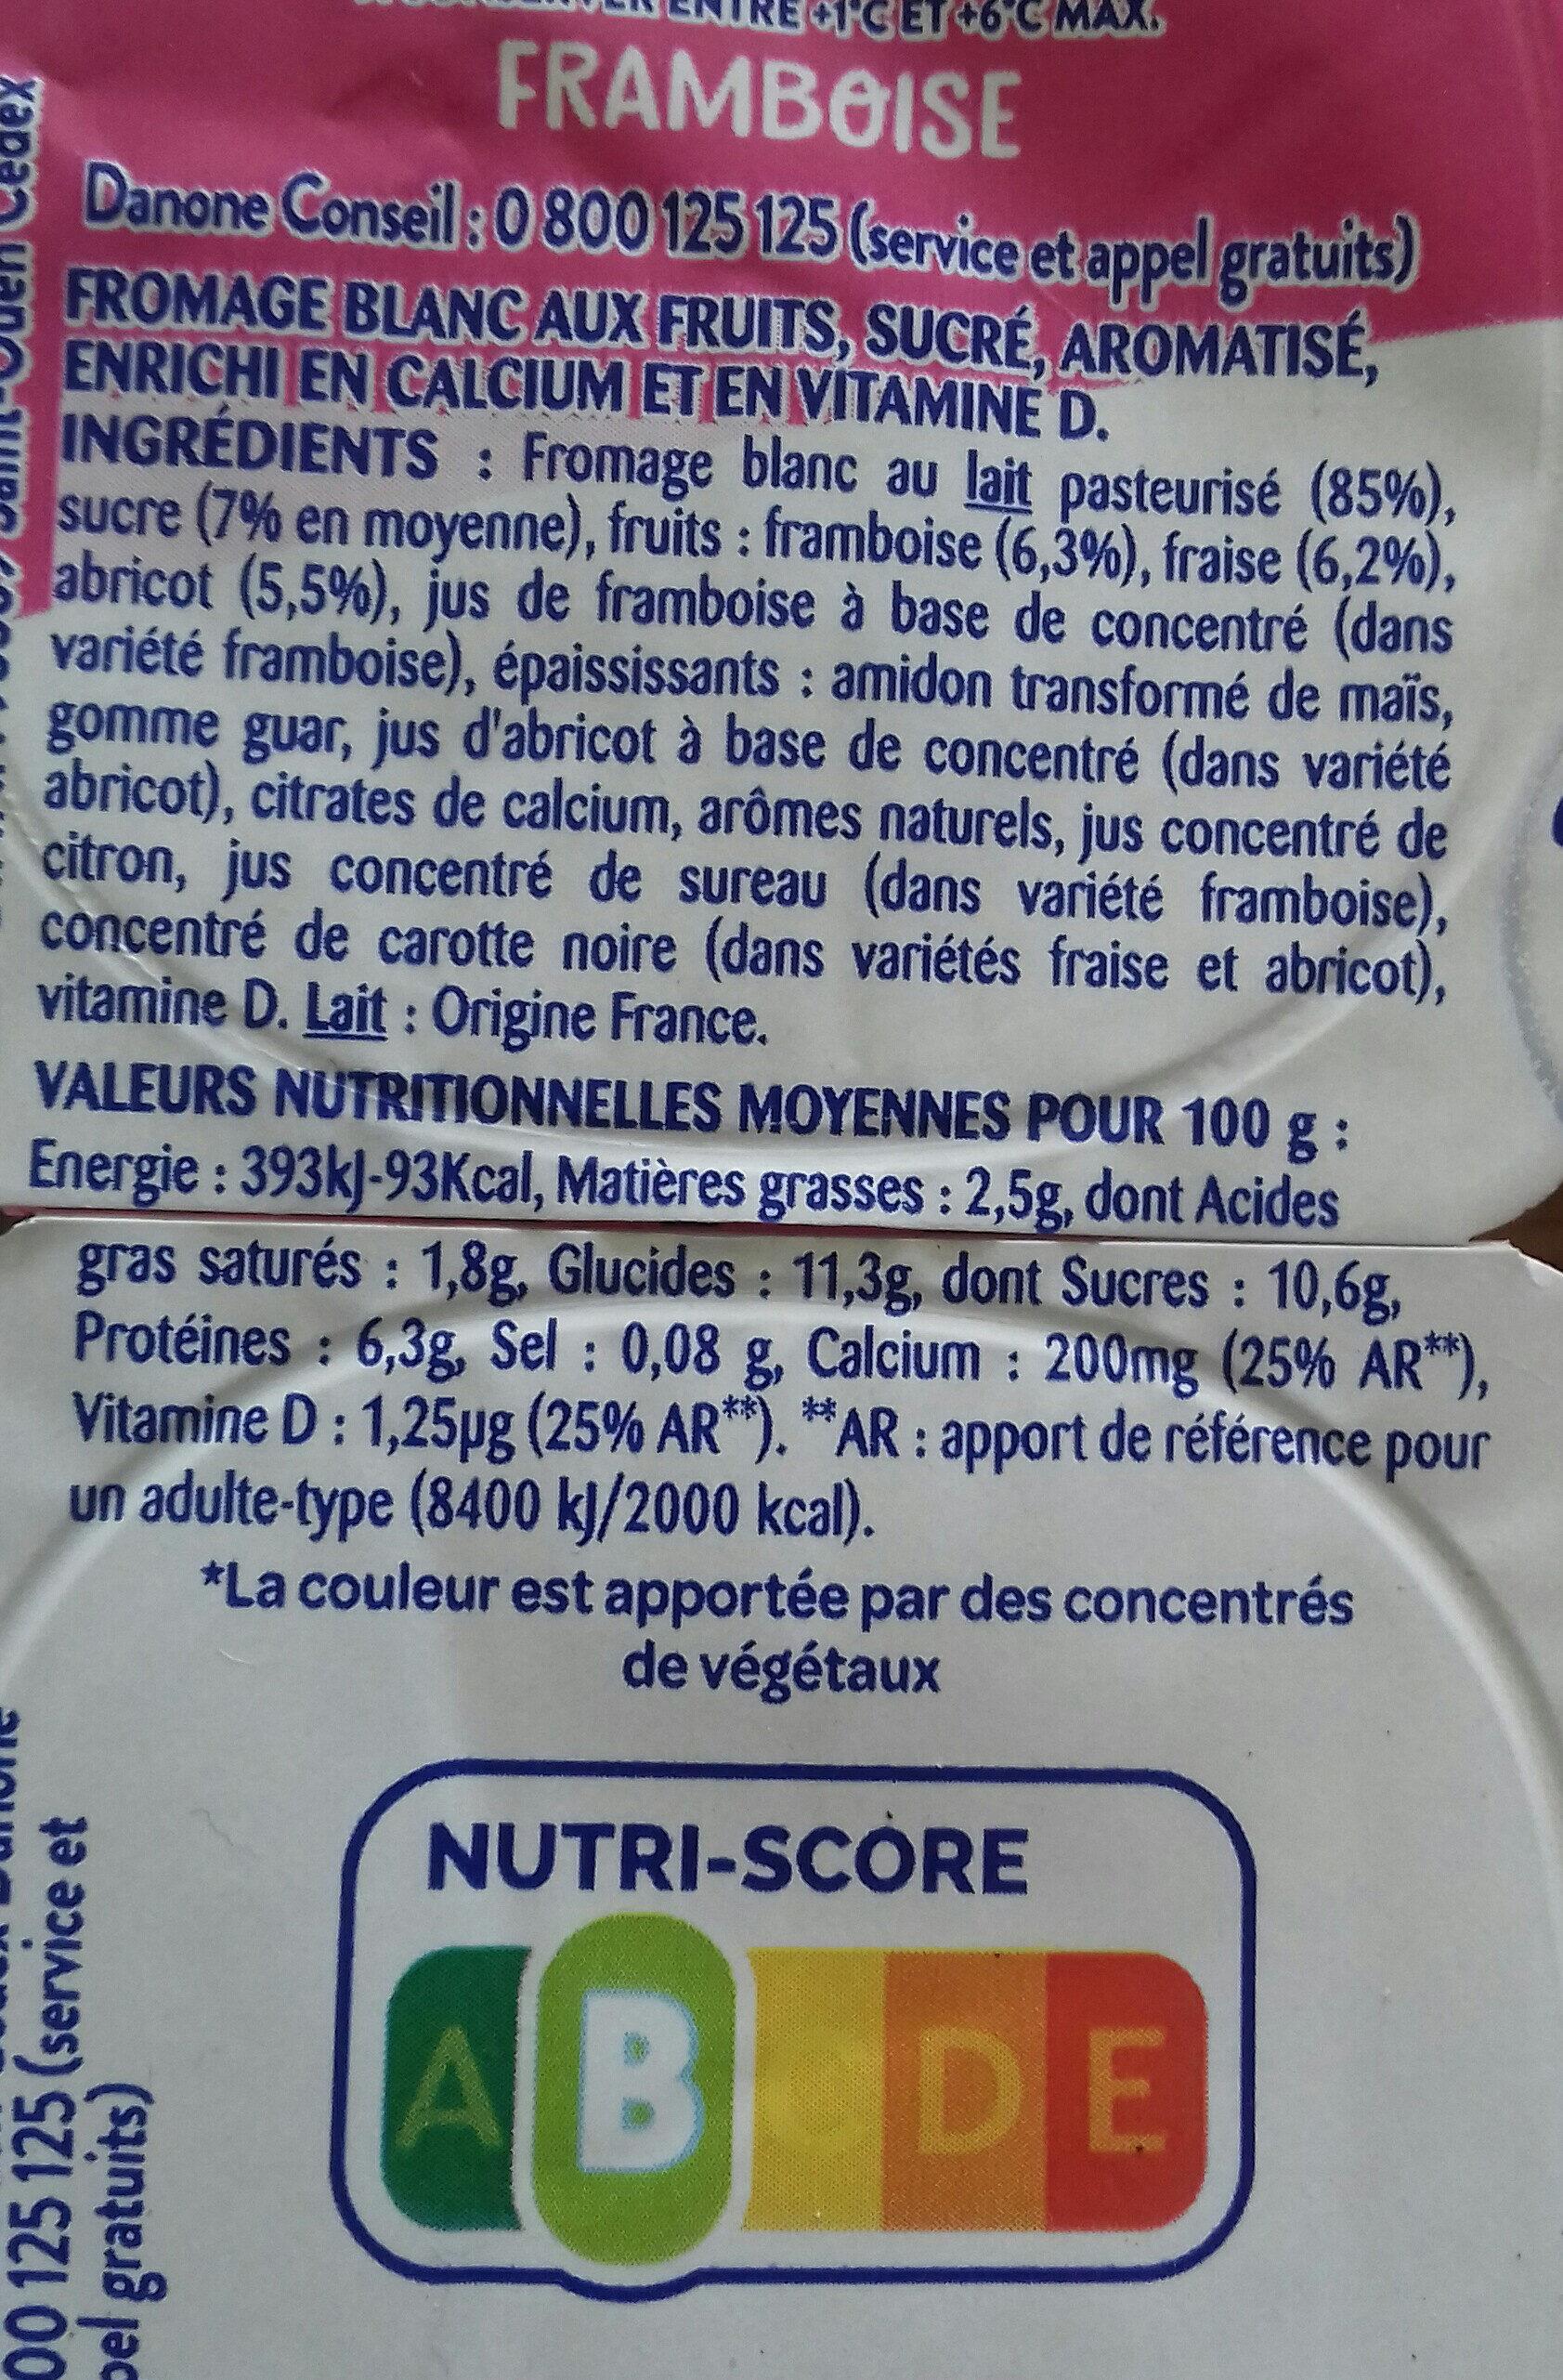 Fromages blancs aux fruits, framboise, abricot et fraise - Product